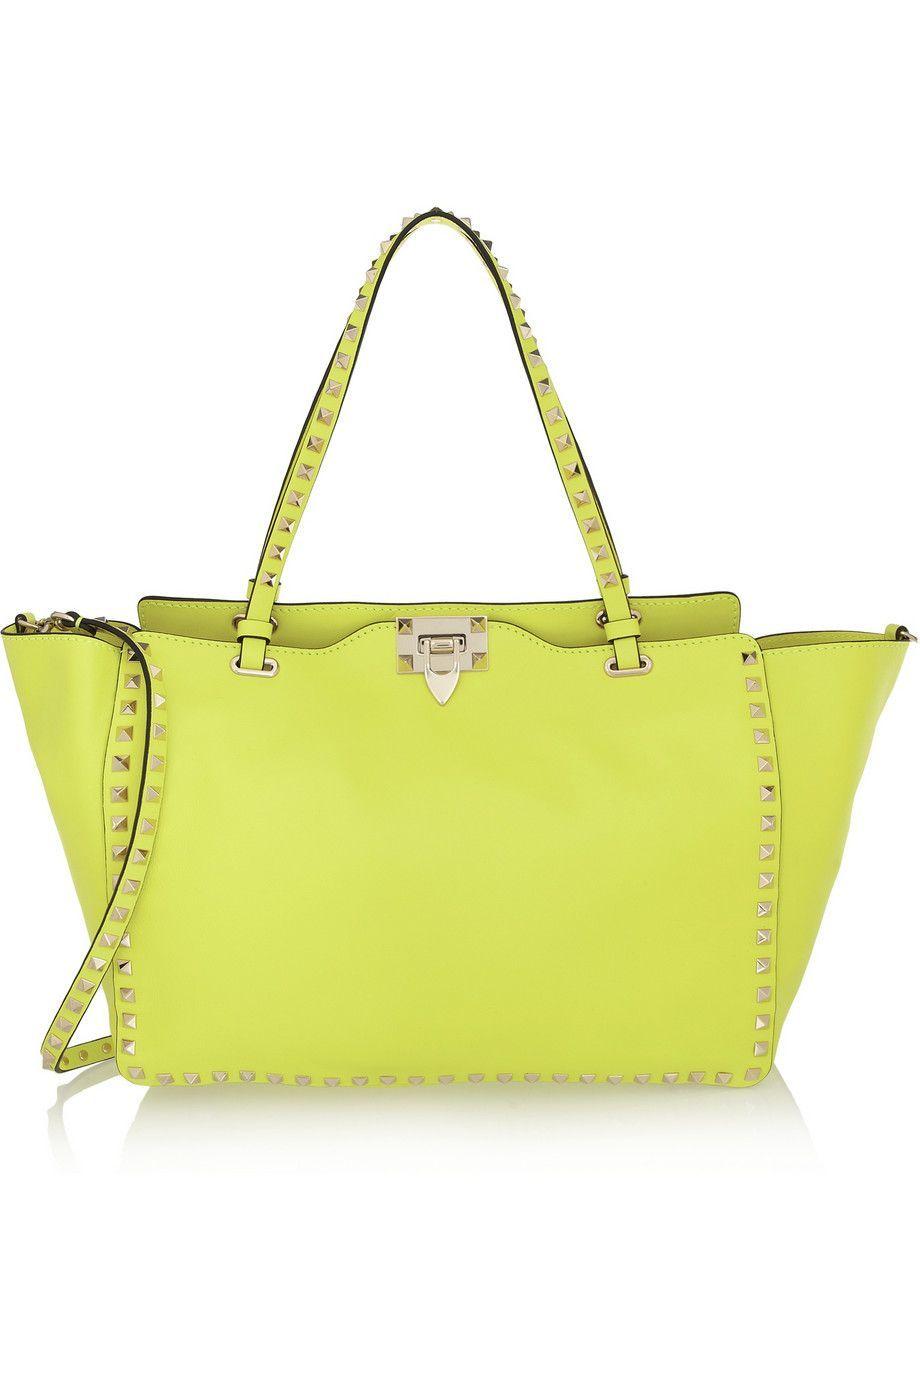 Valentino The Rockstud Neon Leather Tze Bag Yellow